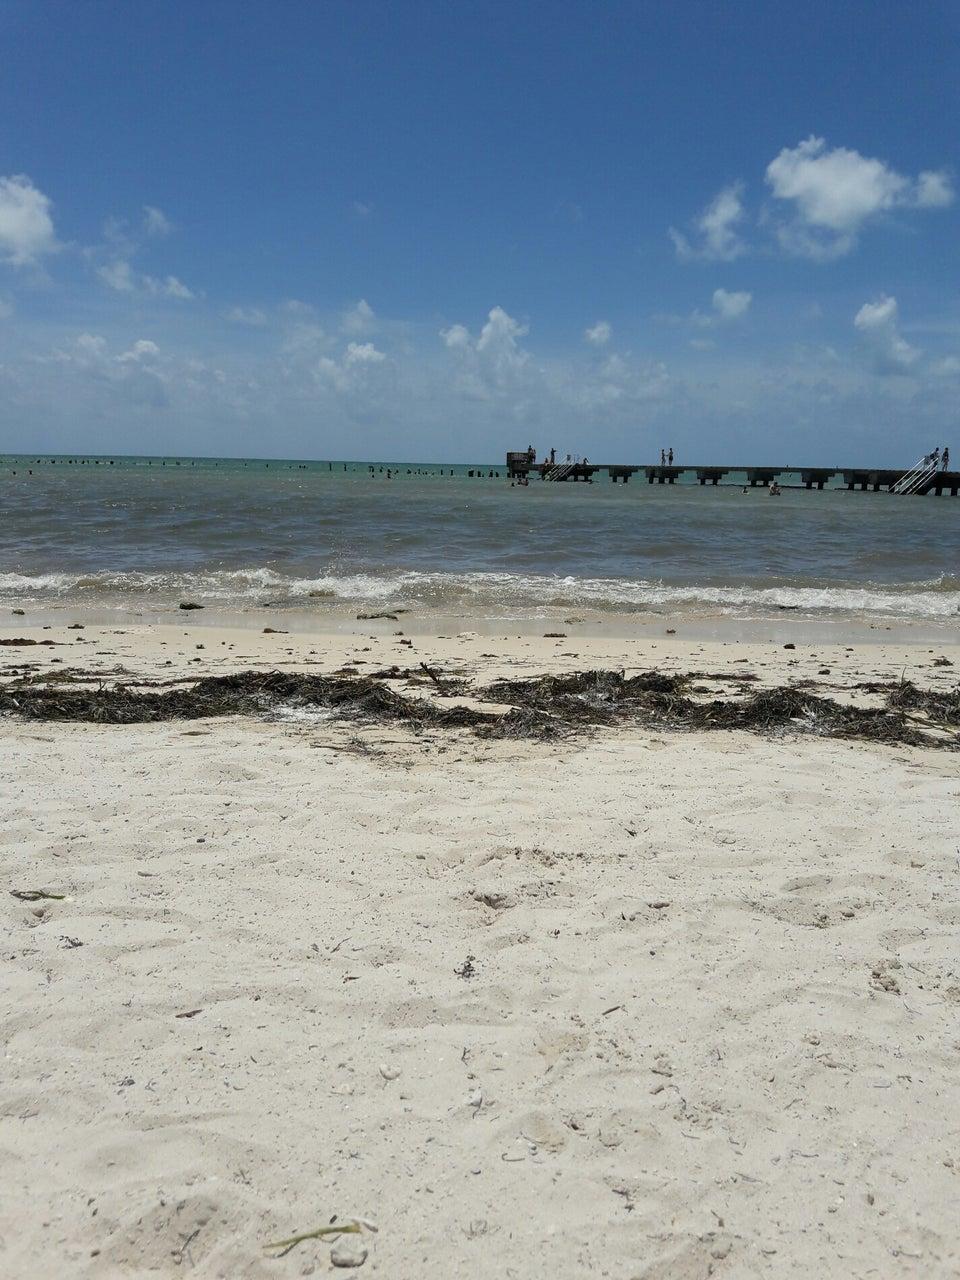 Higg's Beach